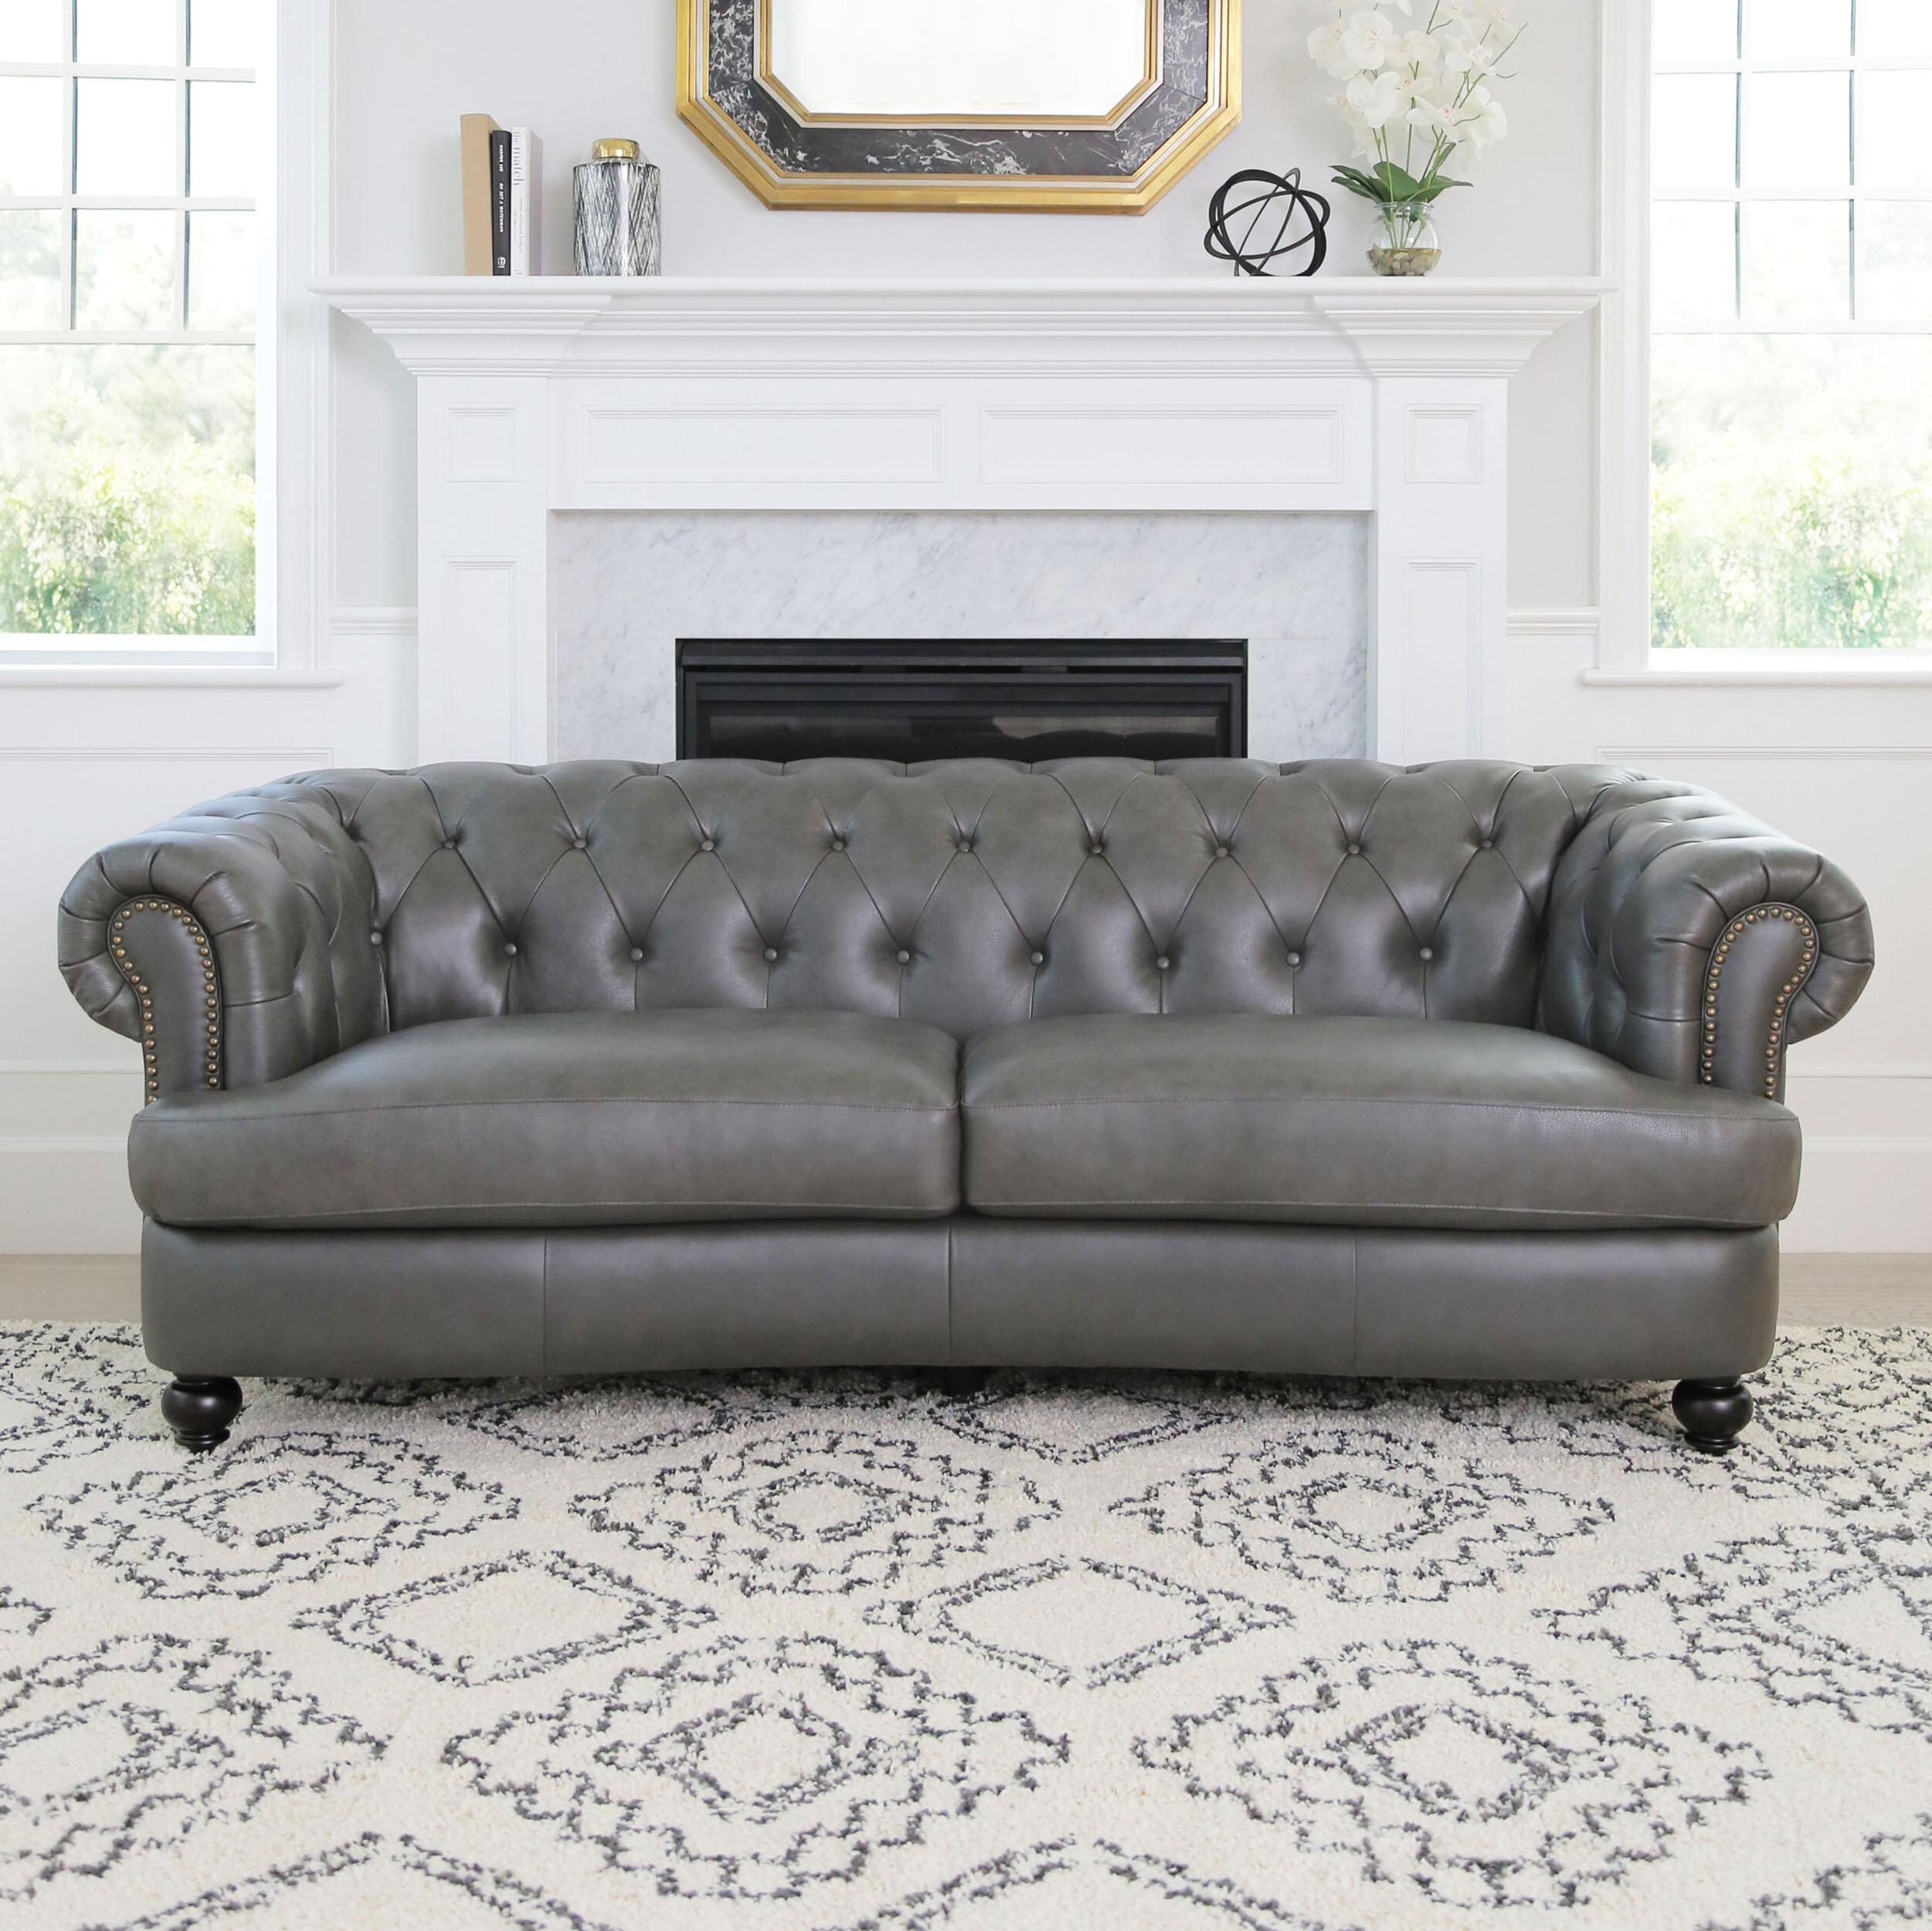 Darby Home Co Barnabas Top Grain Leather Chesterfield Sofa | Wayfair